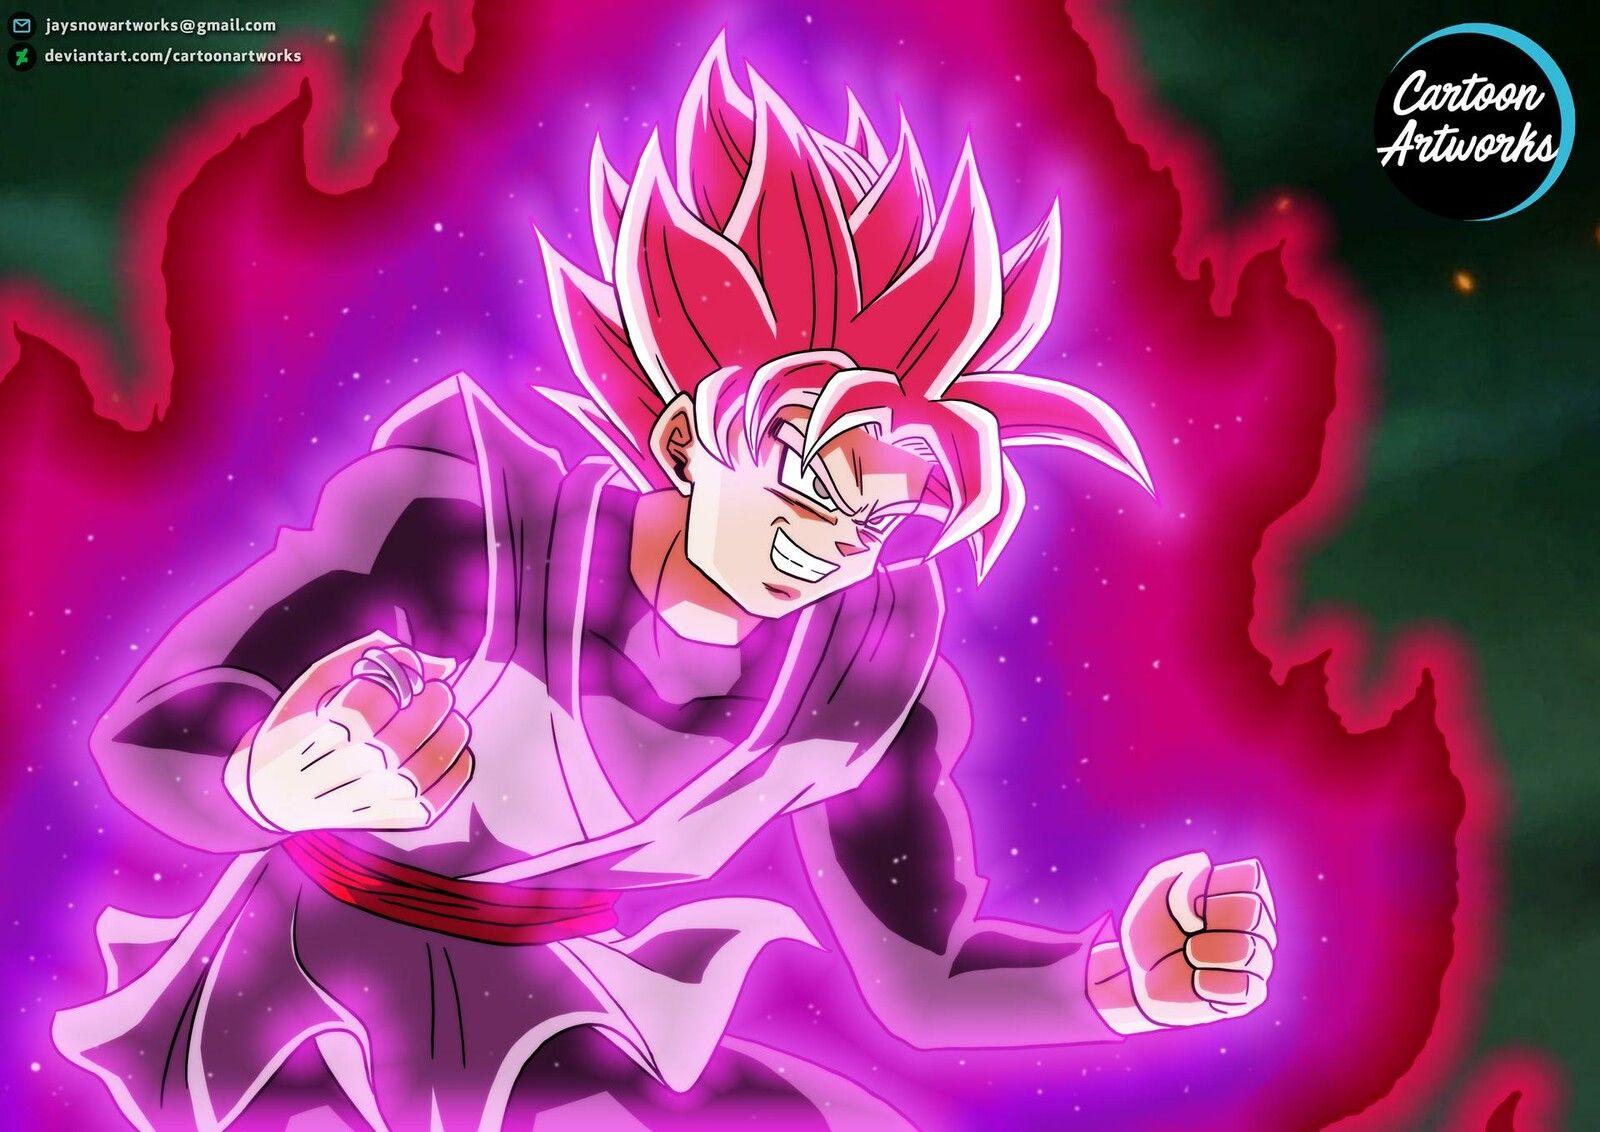 Goku Black Super Saiyan Rose Cartoon Artworks On Artstation At Https Www Artstation Com Artwork 3o8jdm Goku Black Super Saiyan Rose Goku Black Super Saiyan